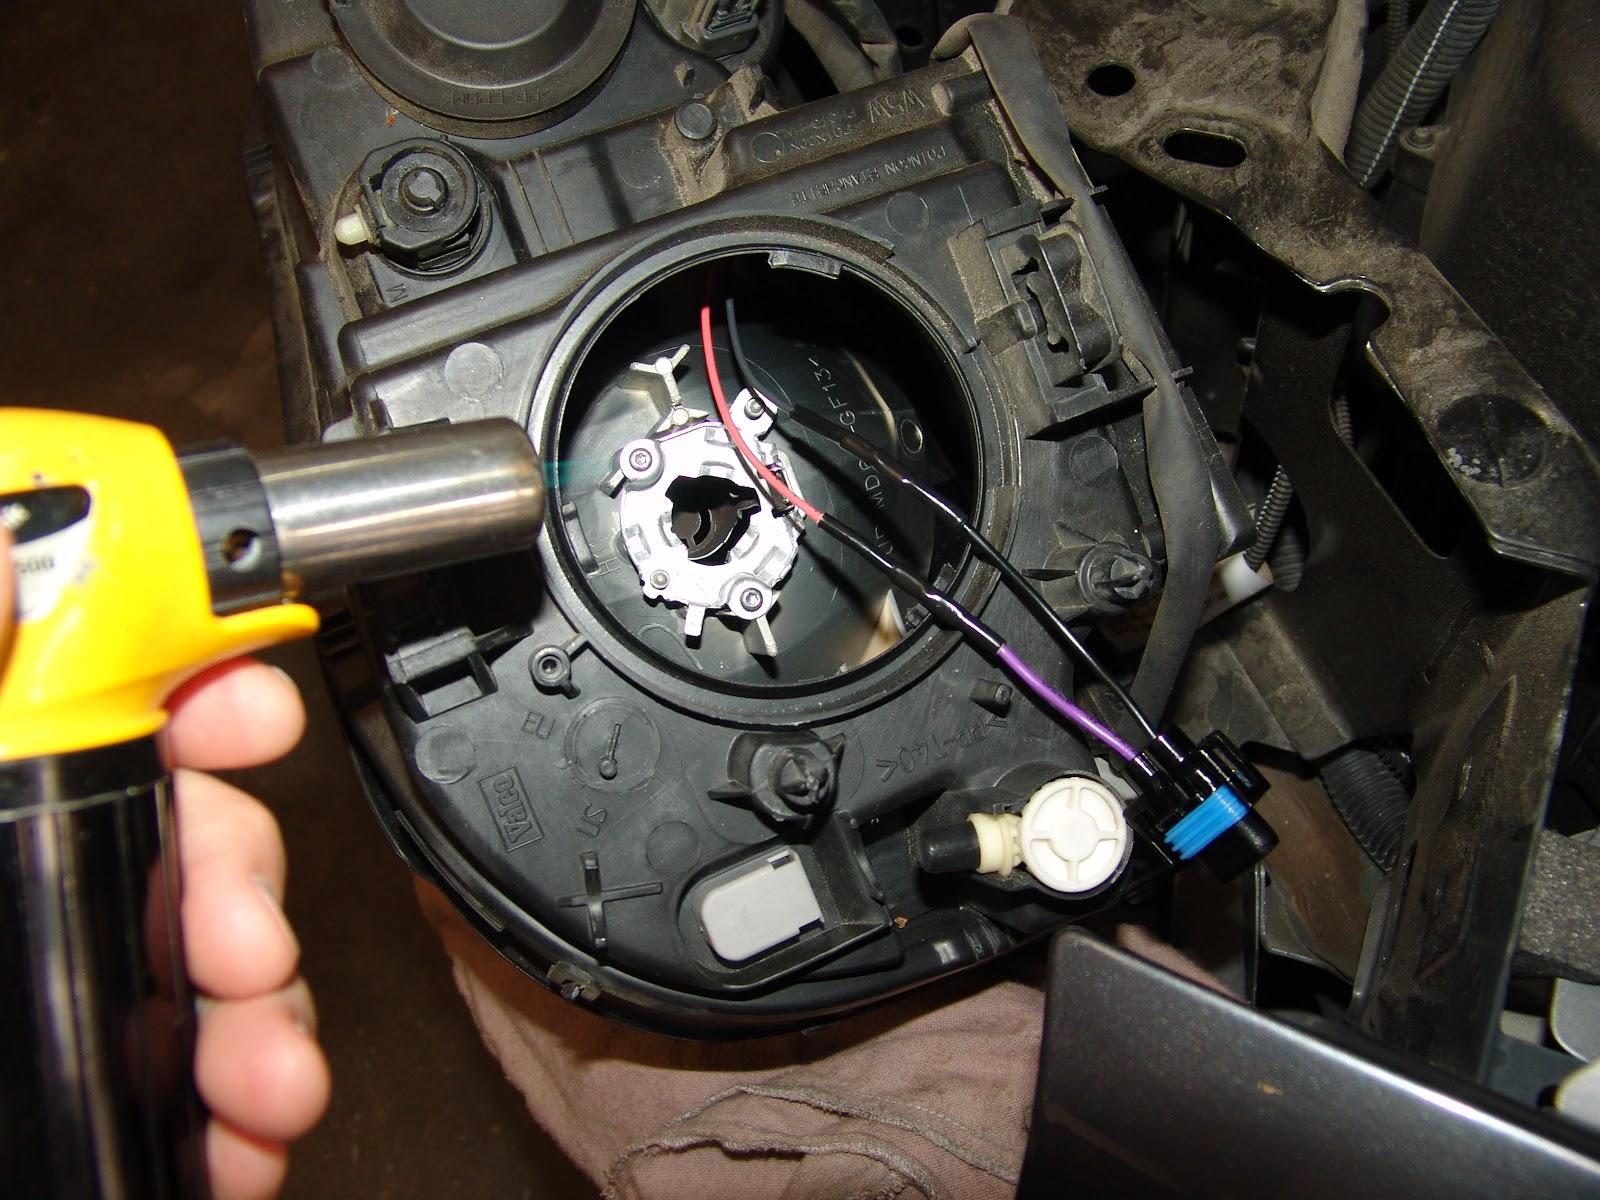 2008 Volvo XC90, Headlight Does Not Work